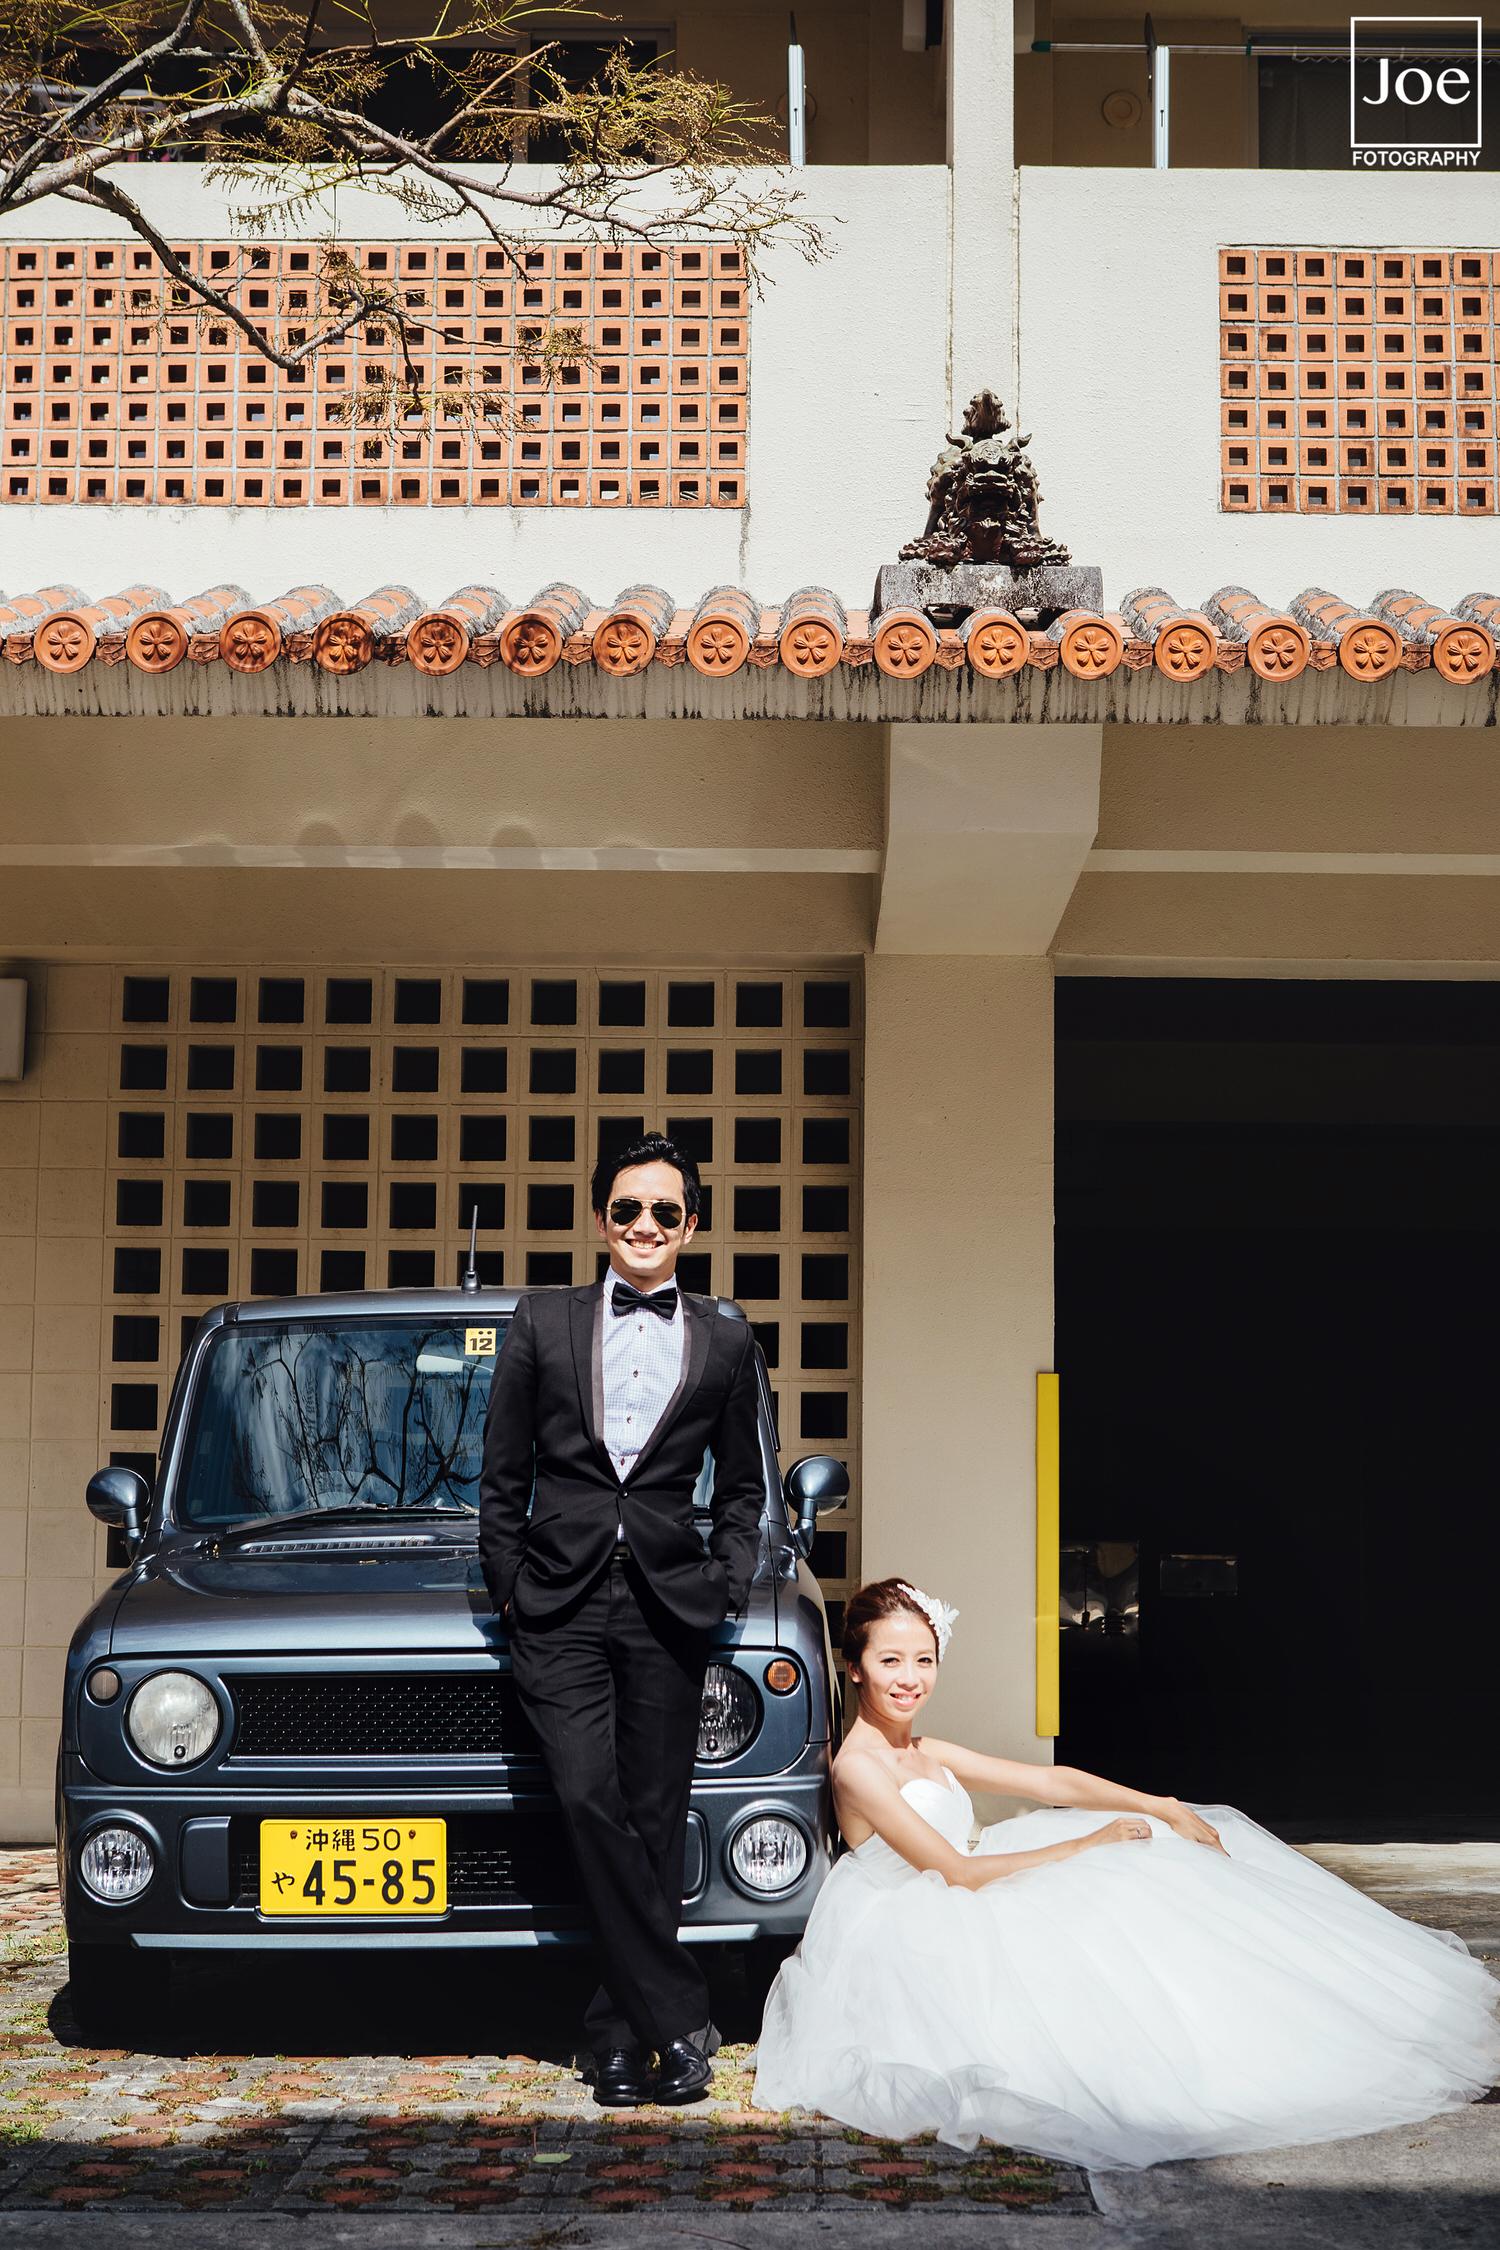 15-okinawa-pre-wedding-melody-amigo-joe-fotography.jpg